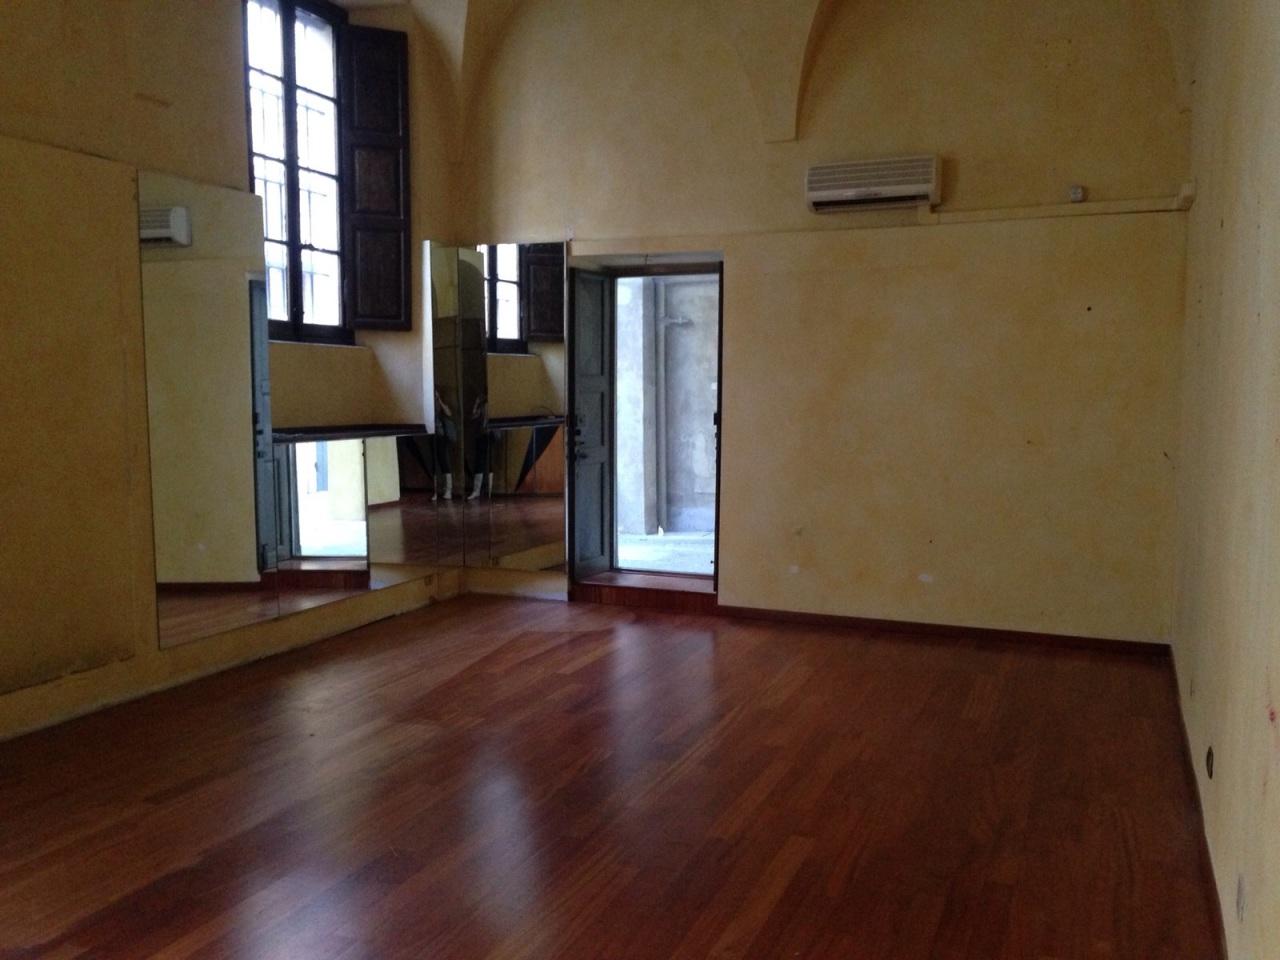 Commerciale - Due Vetrine a Parma Centro, Parma Rif. 11230186